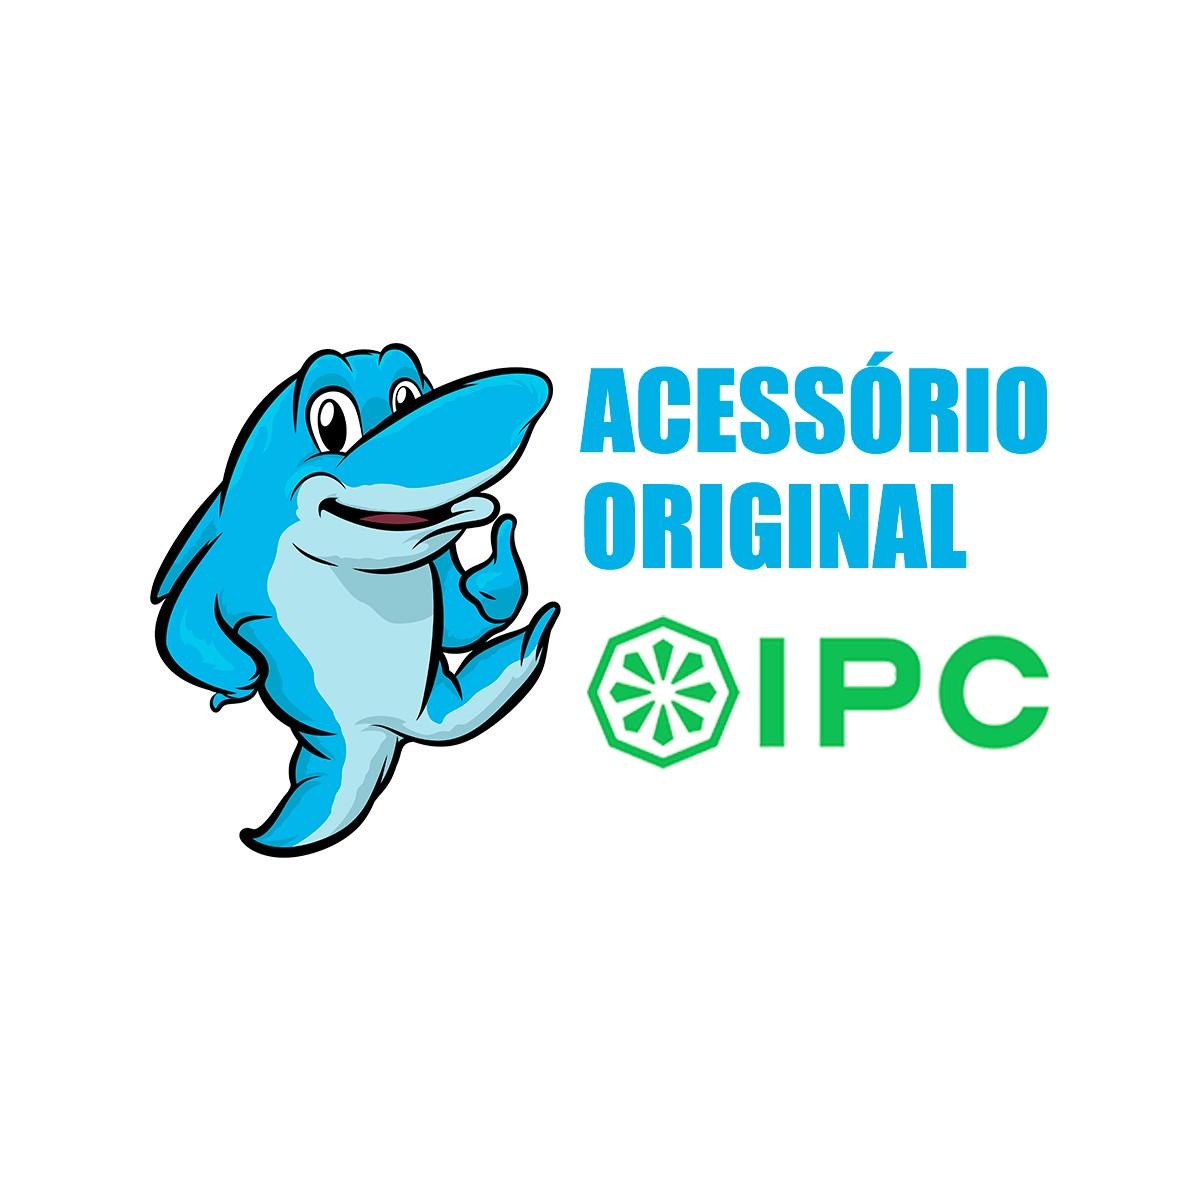 Filtro Cartucho Original IPC para Aspirador de pó LAVAWET